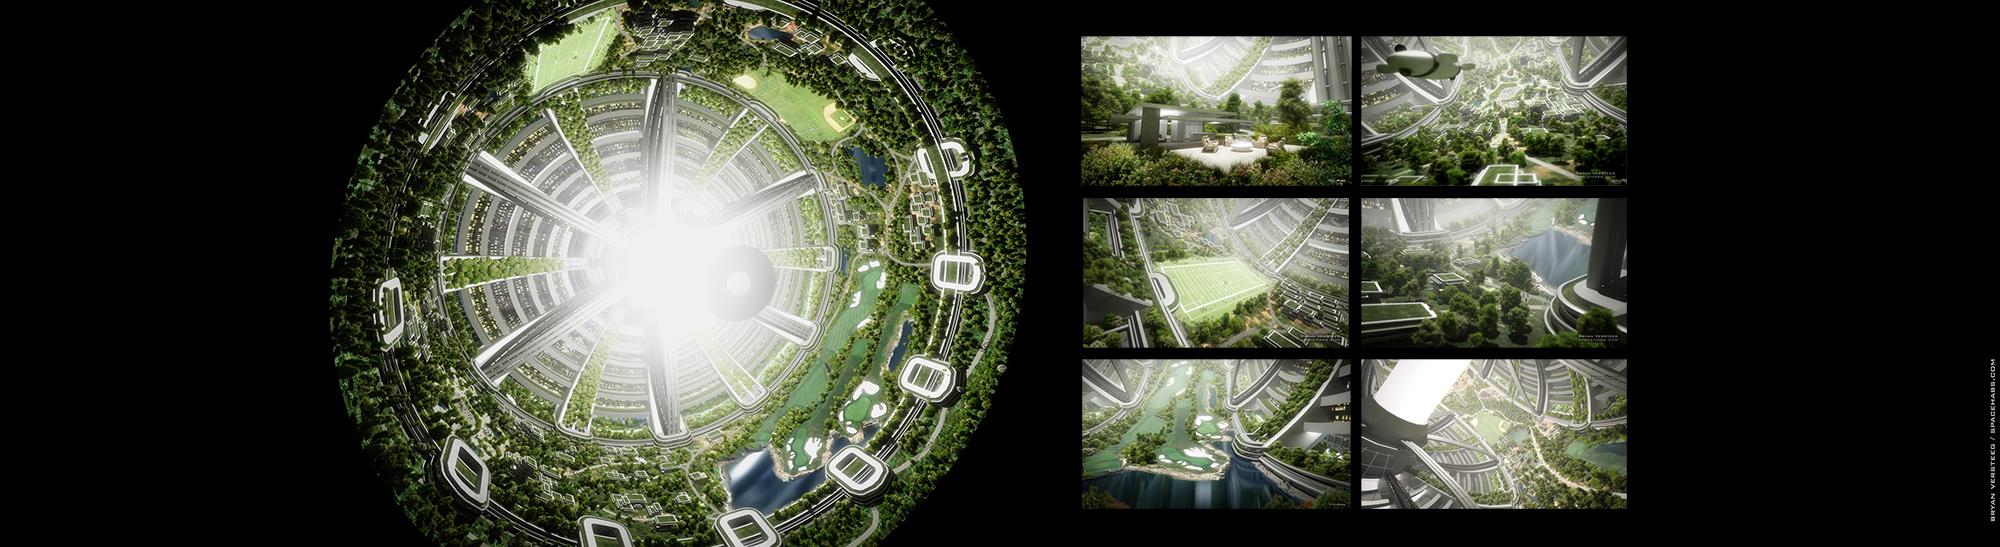 Kalpana-section-collage2